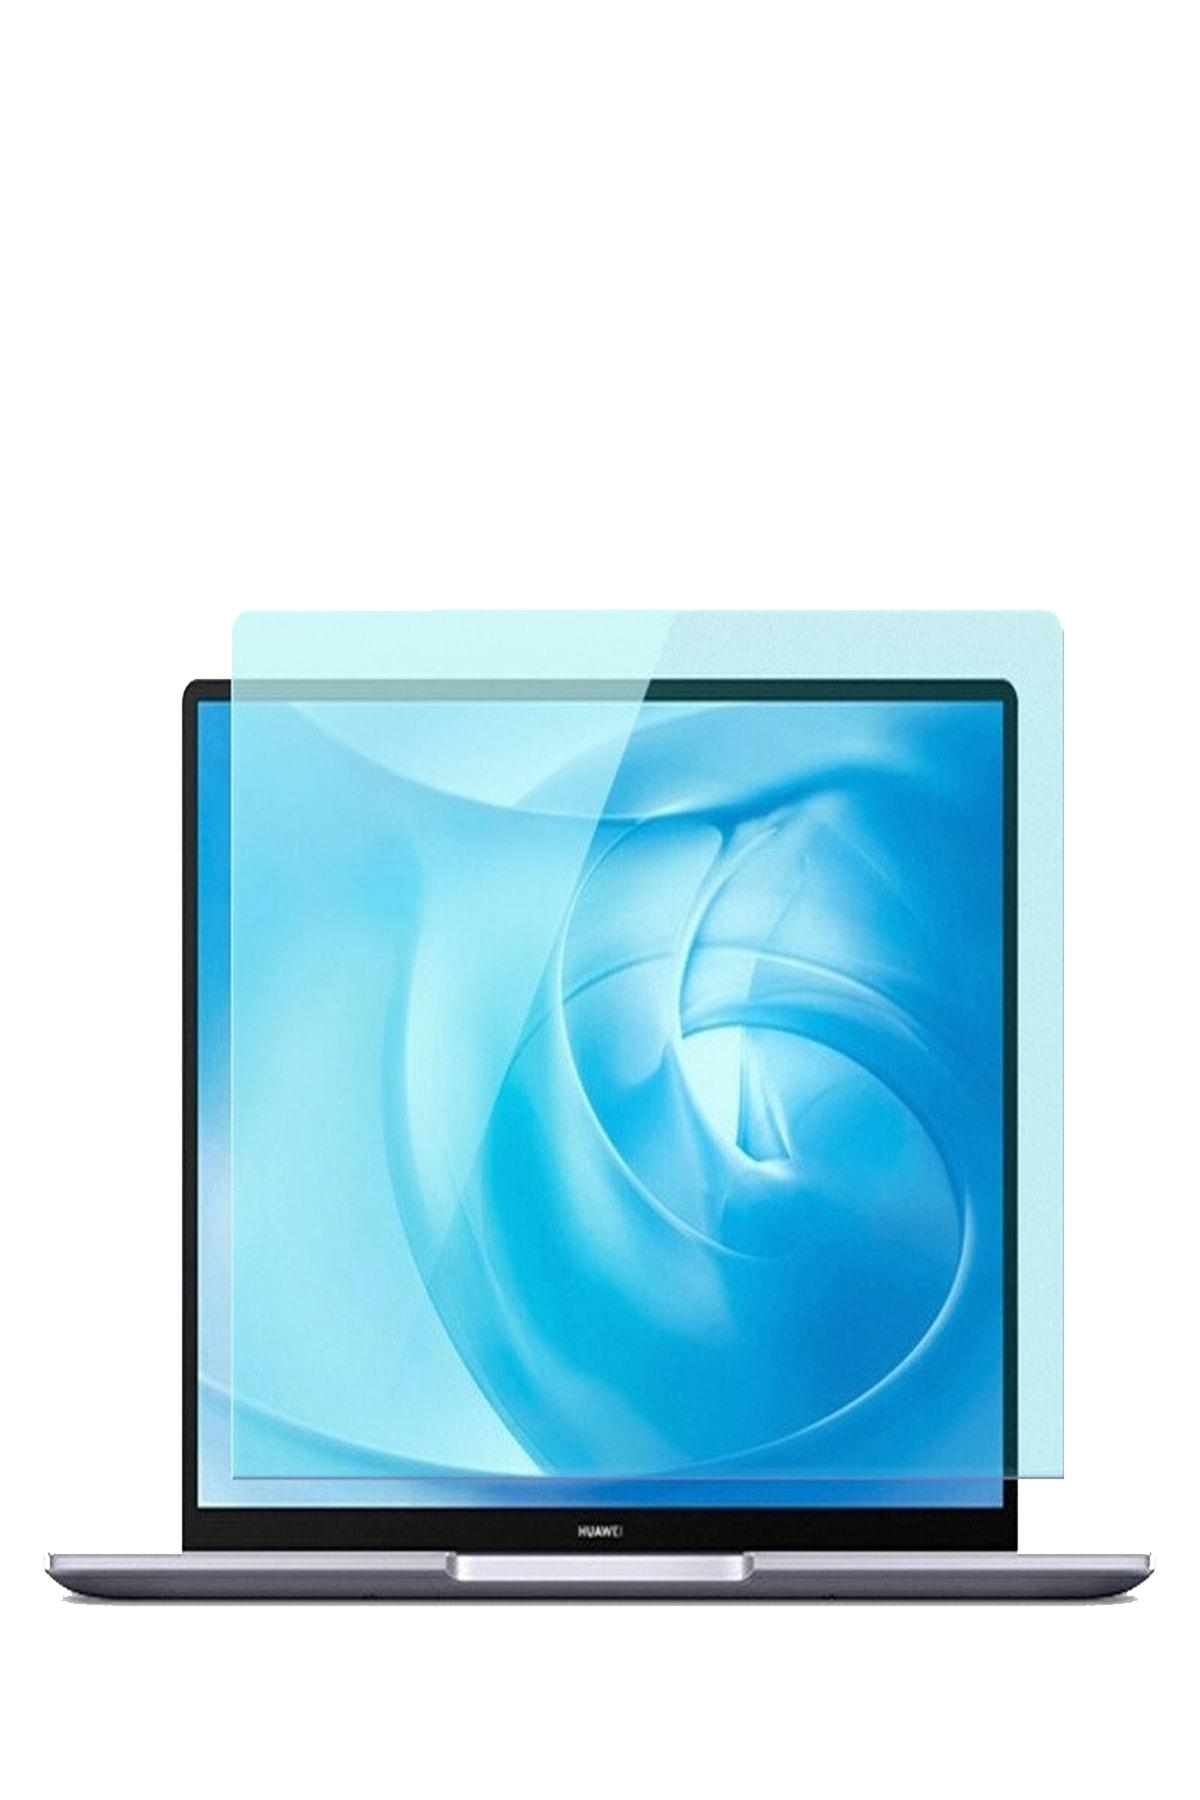 Microcase Huawei Matebook 14 Uyumlu Nano Esnek Ekran Koruma Filmi